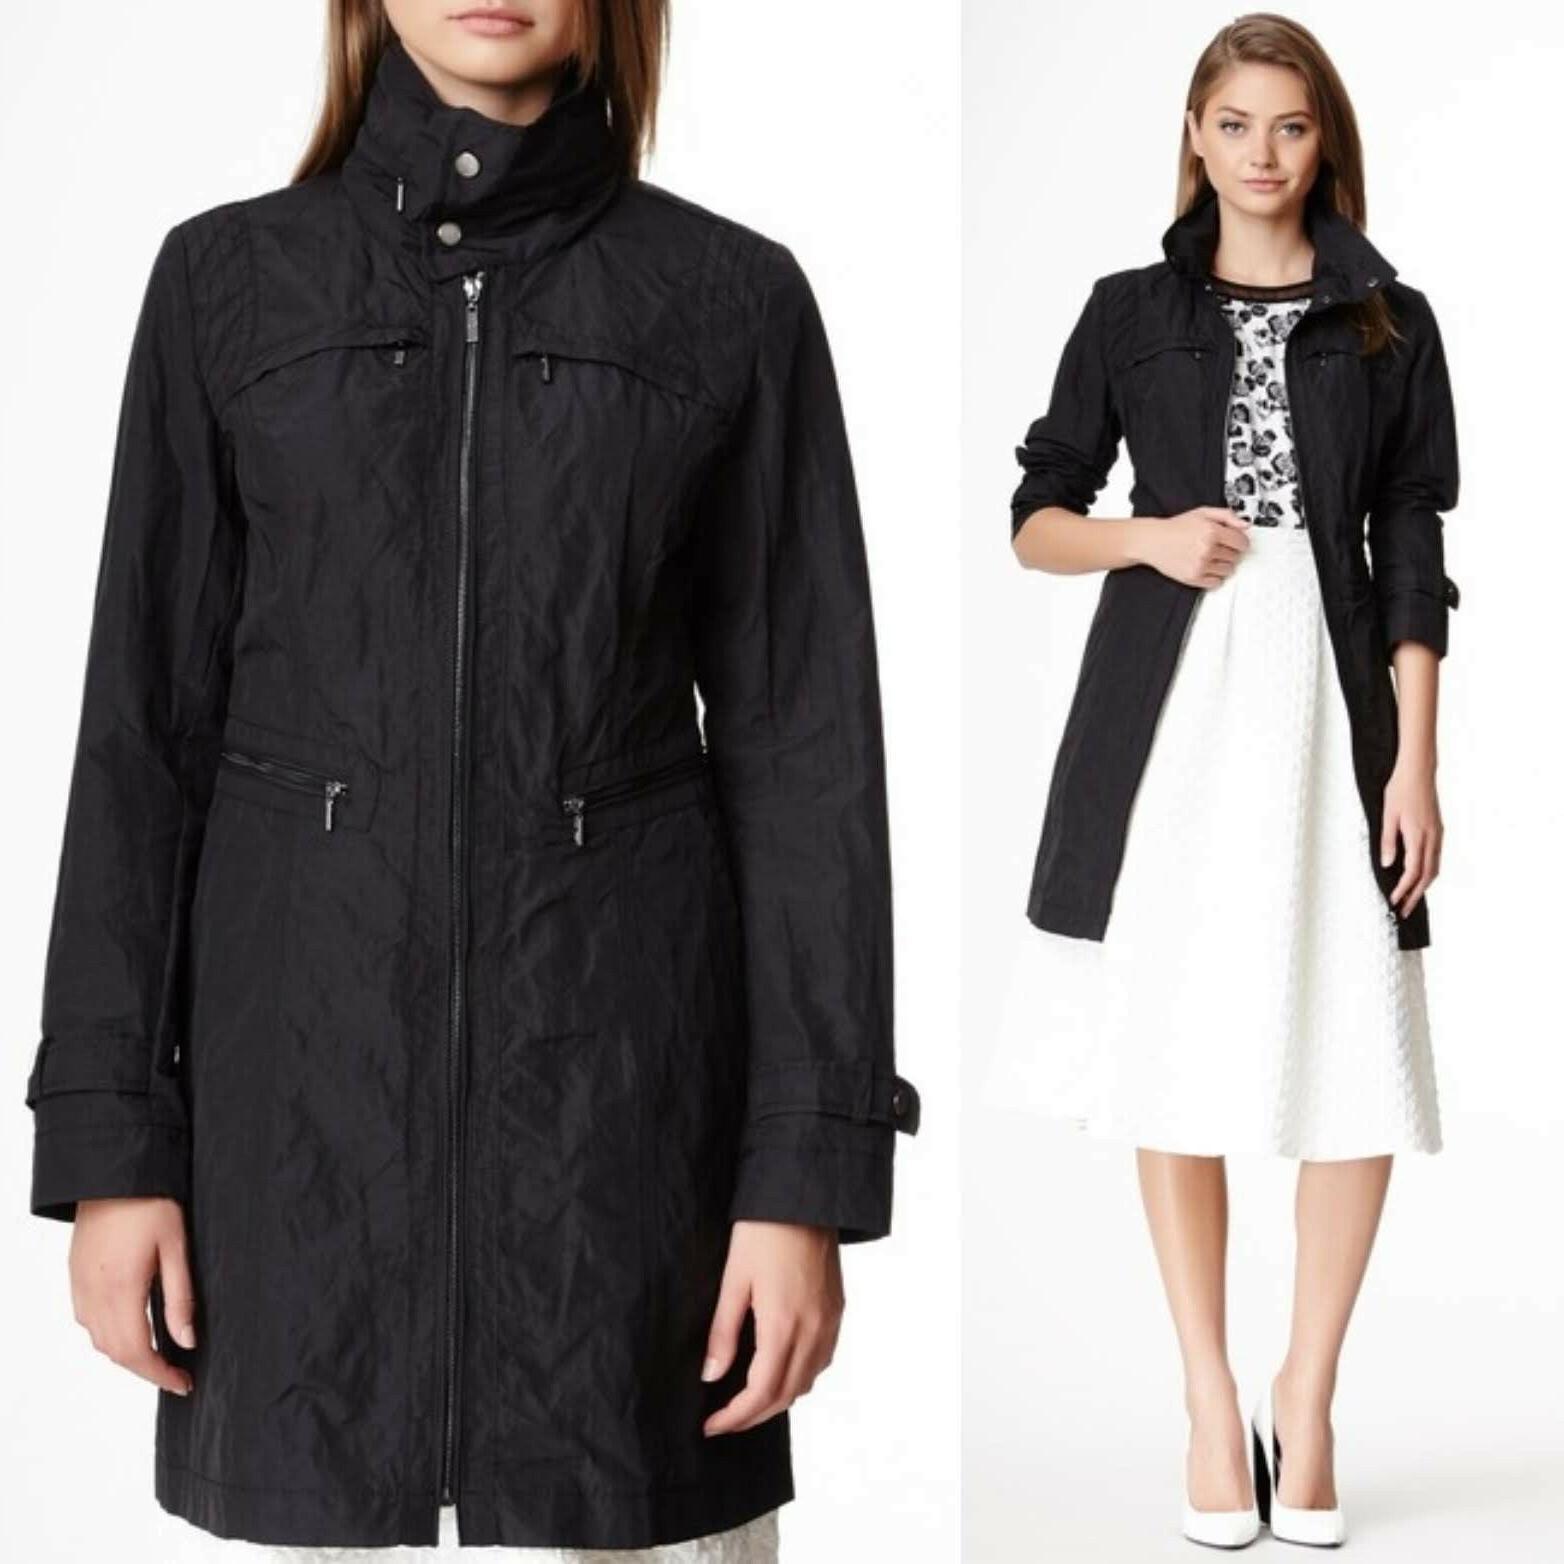 nwt black hooded packable raincoat jacket size